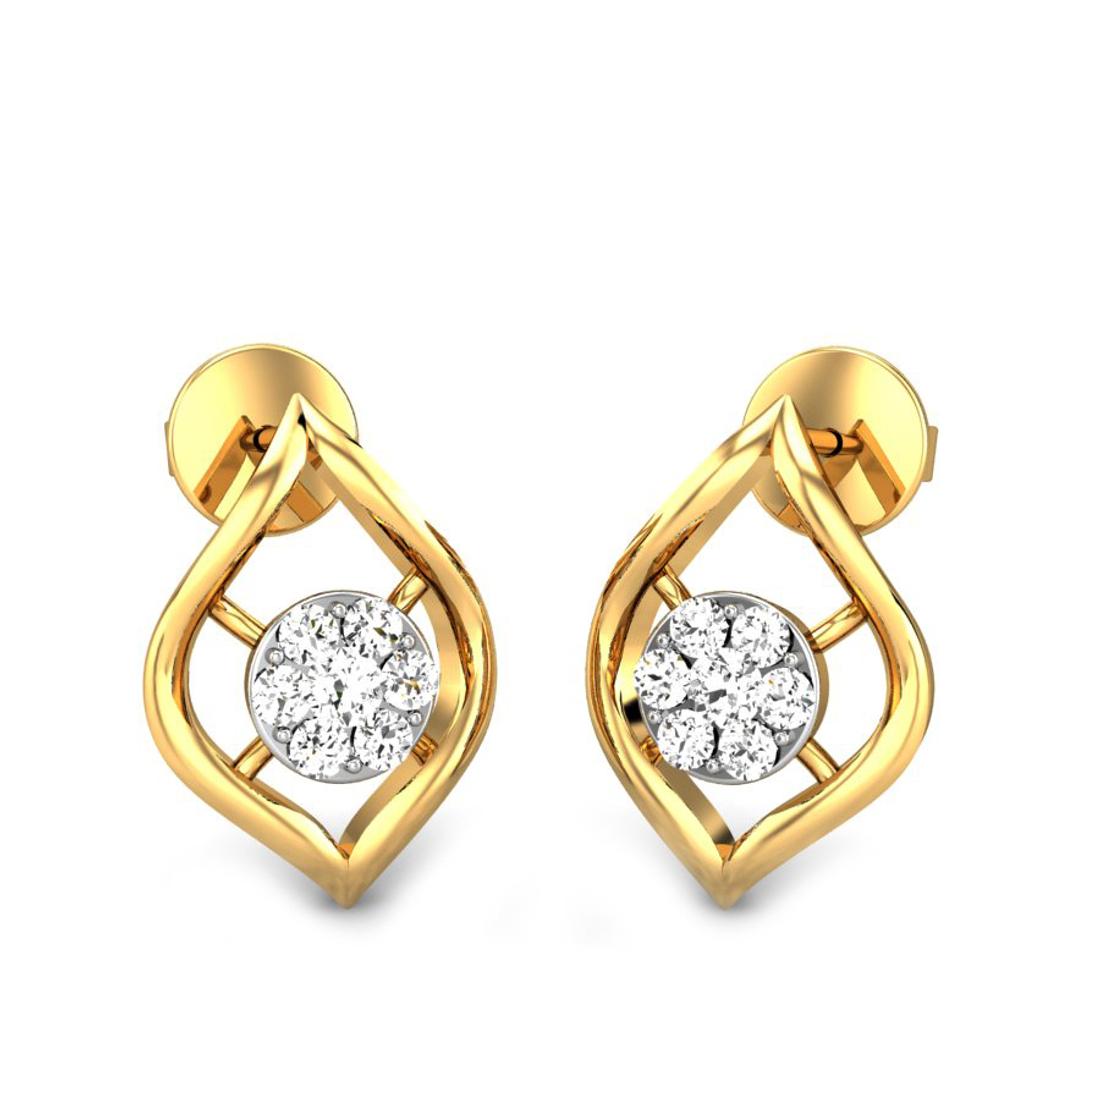 Candere by Kalyan Jewellers Yellow Gold Cari Ziah Diamond Earrings for Women (IGI Certified Diamonds)